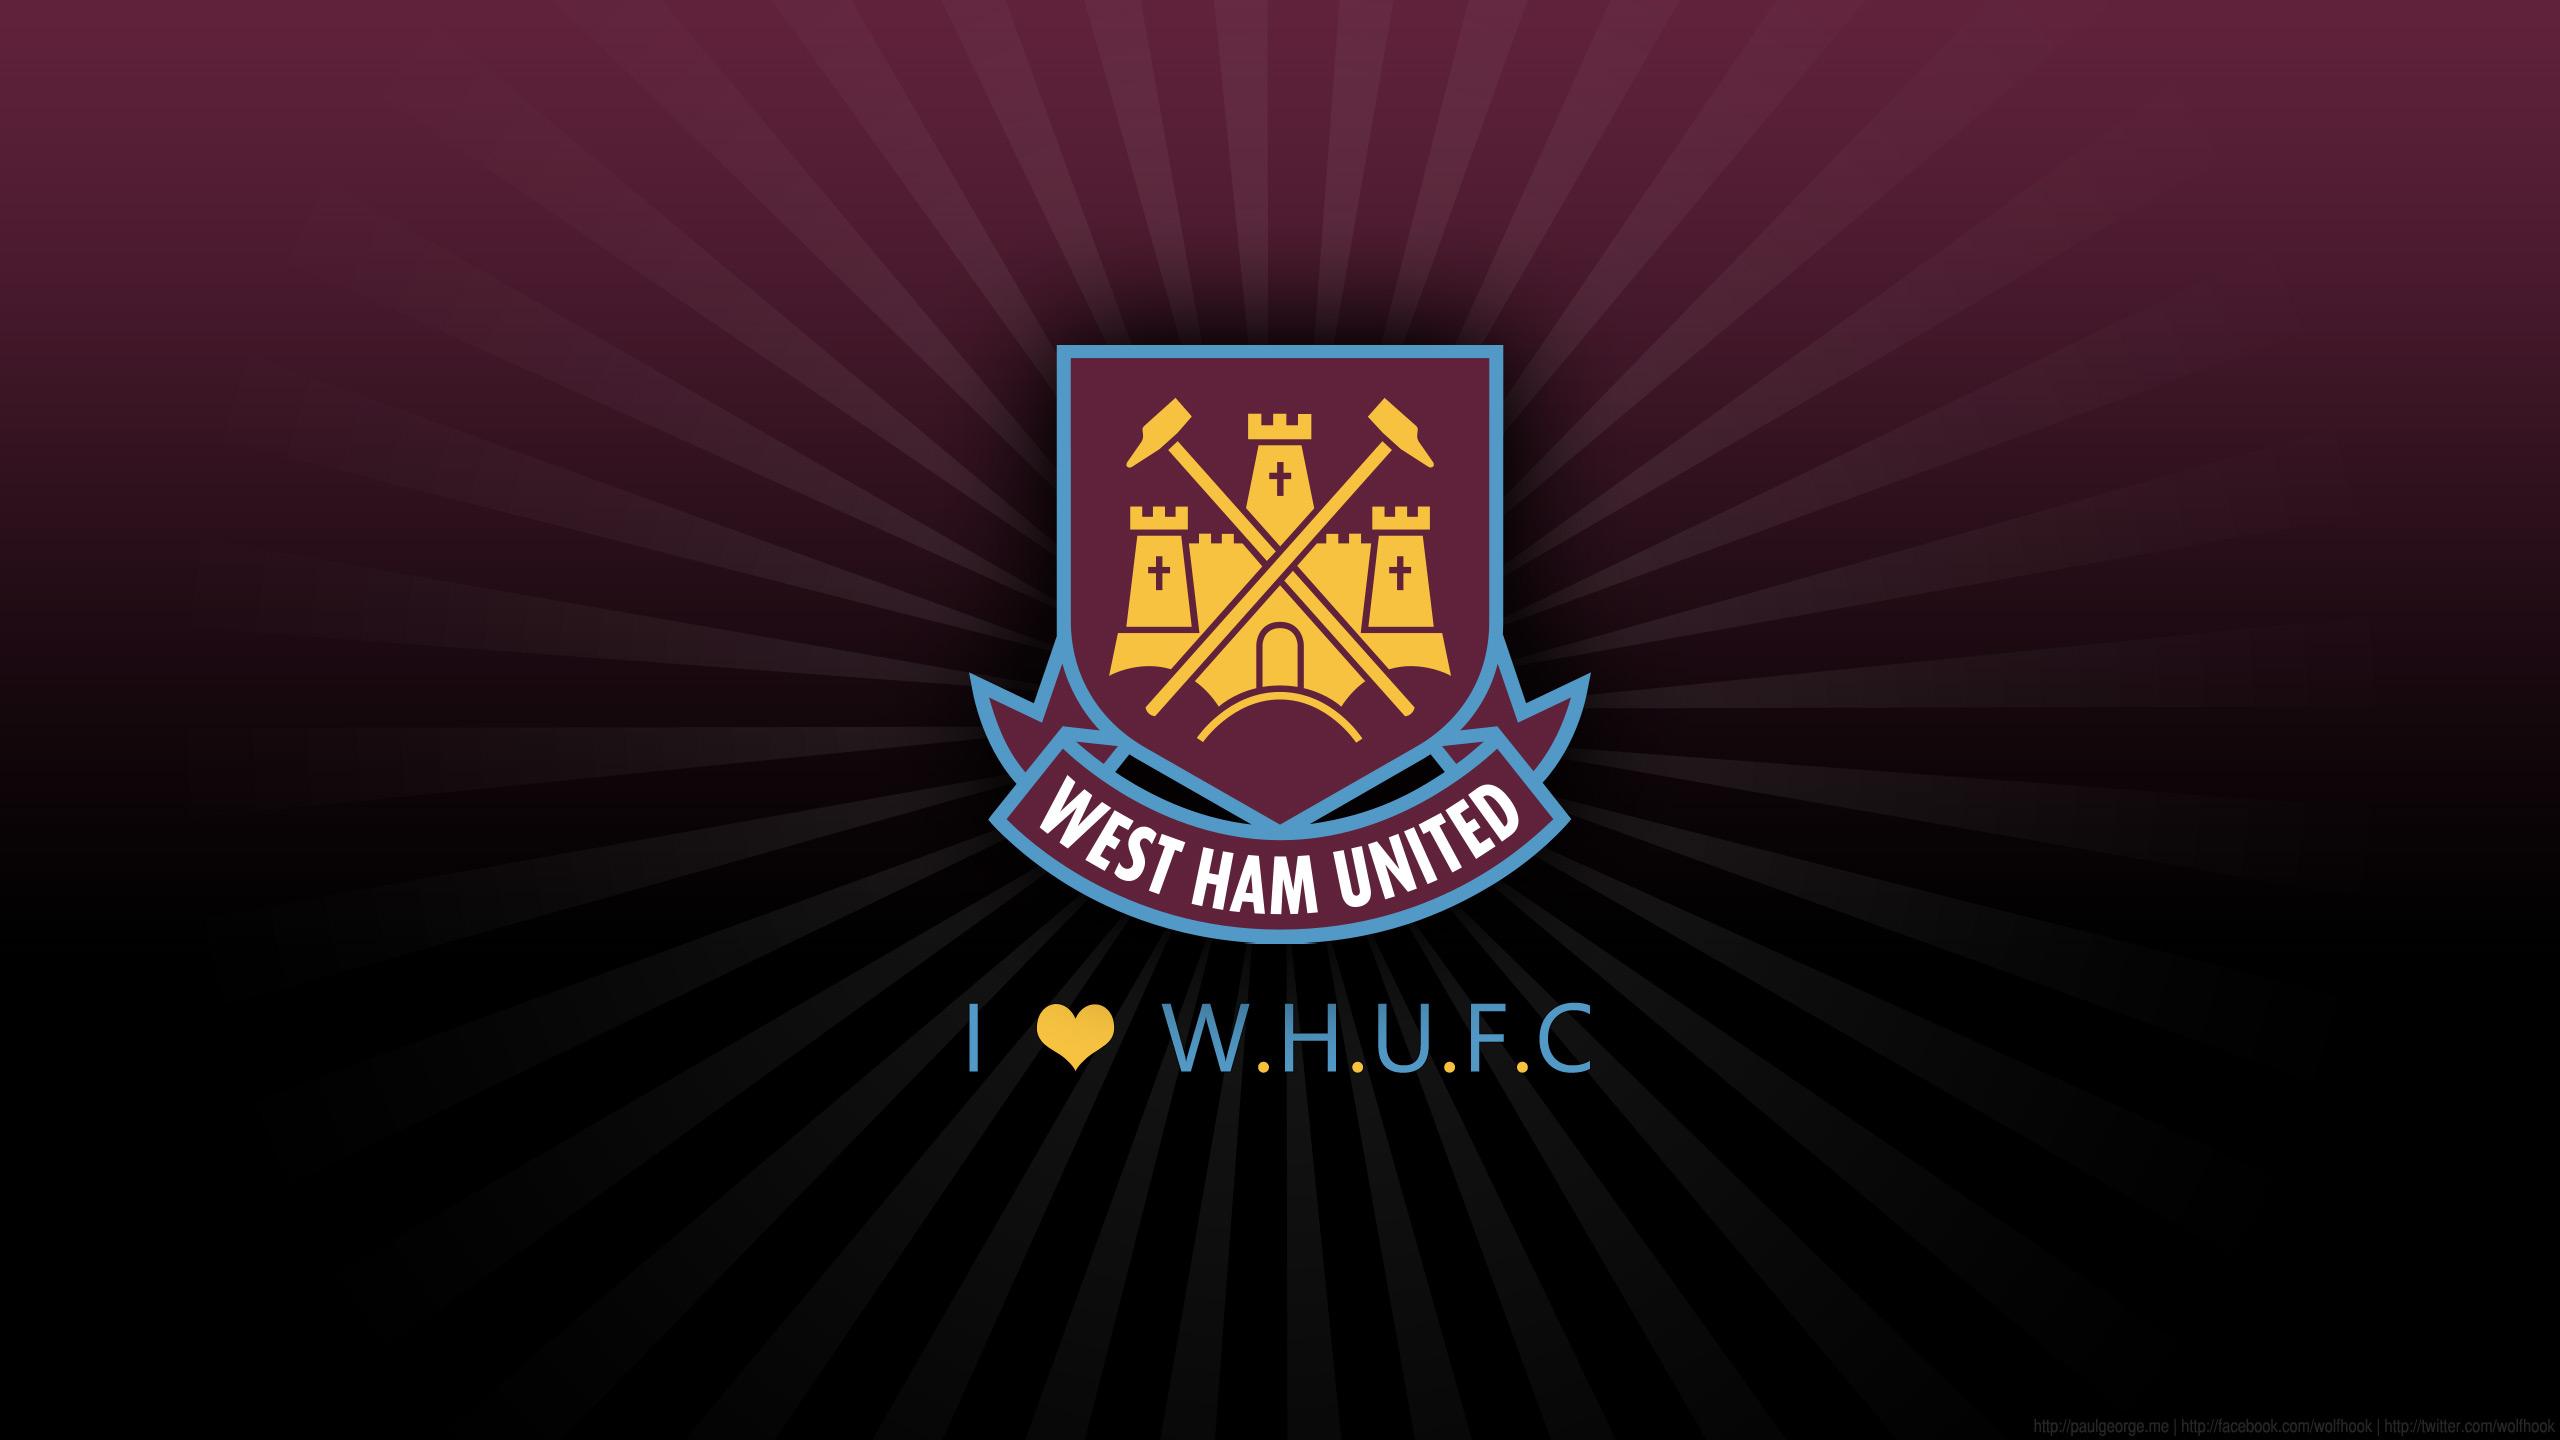 West Ham United FC HD Wallpaper Background Image 2560x1440 2560x1440